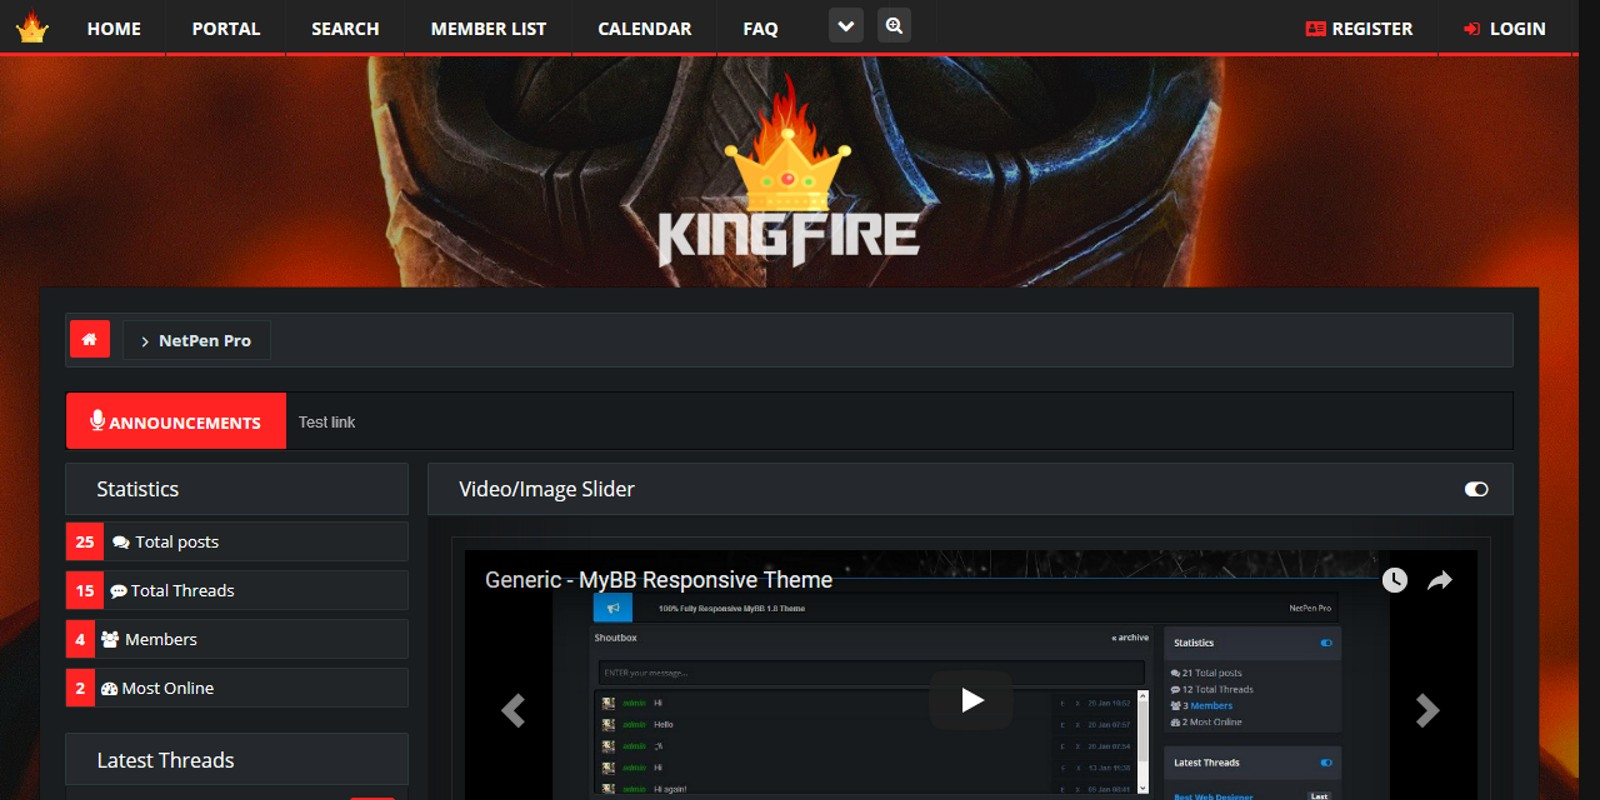 KingFire - Responsive MyBB Theme